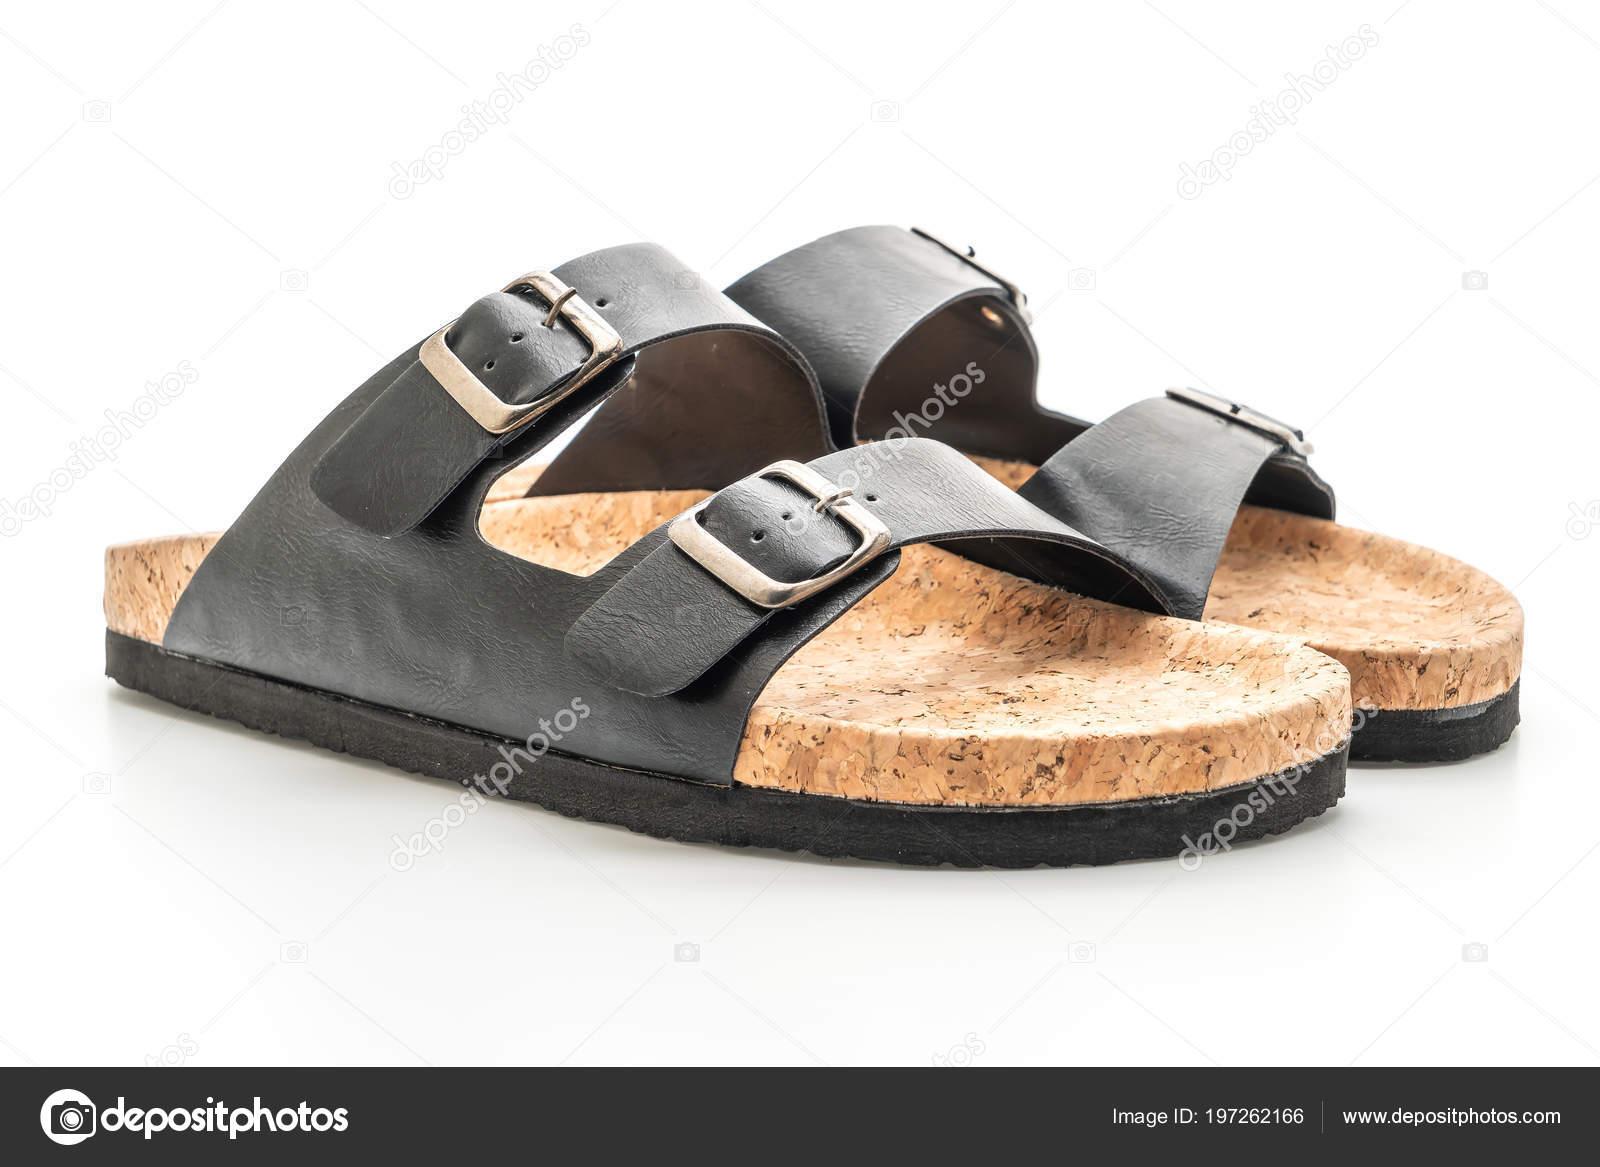 91e85a9dbfc78 Men Women Unisex Fashion Leather Sandals Isolated White Background — Stock  Photo